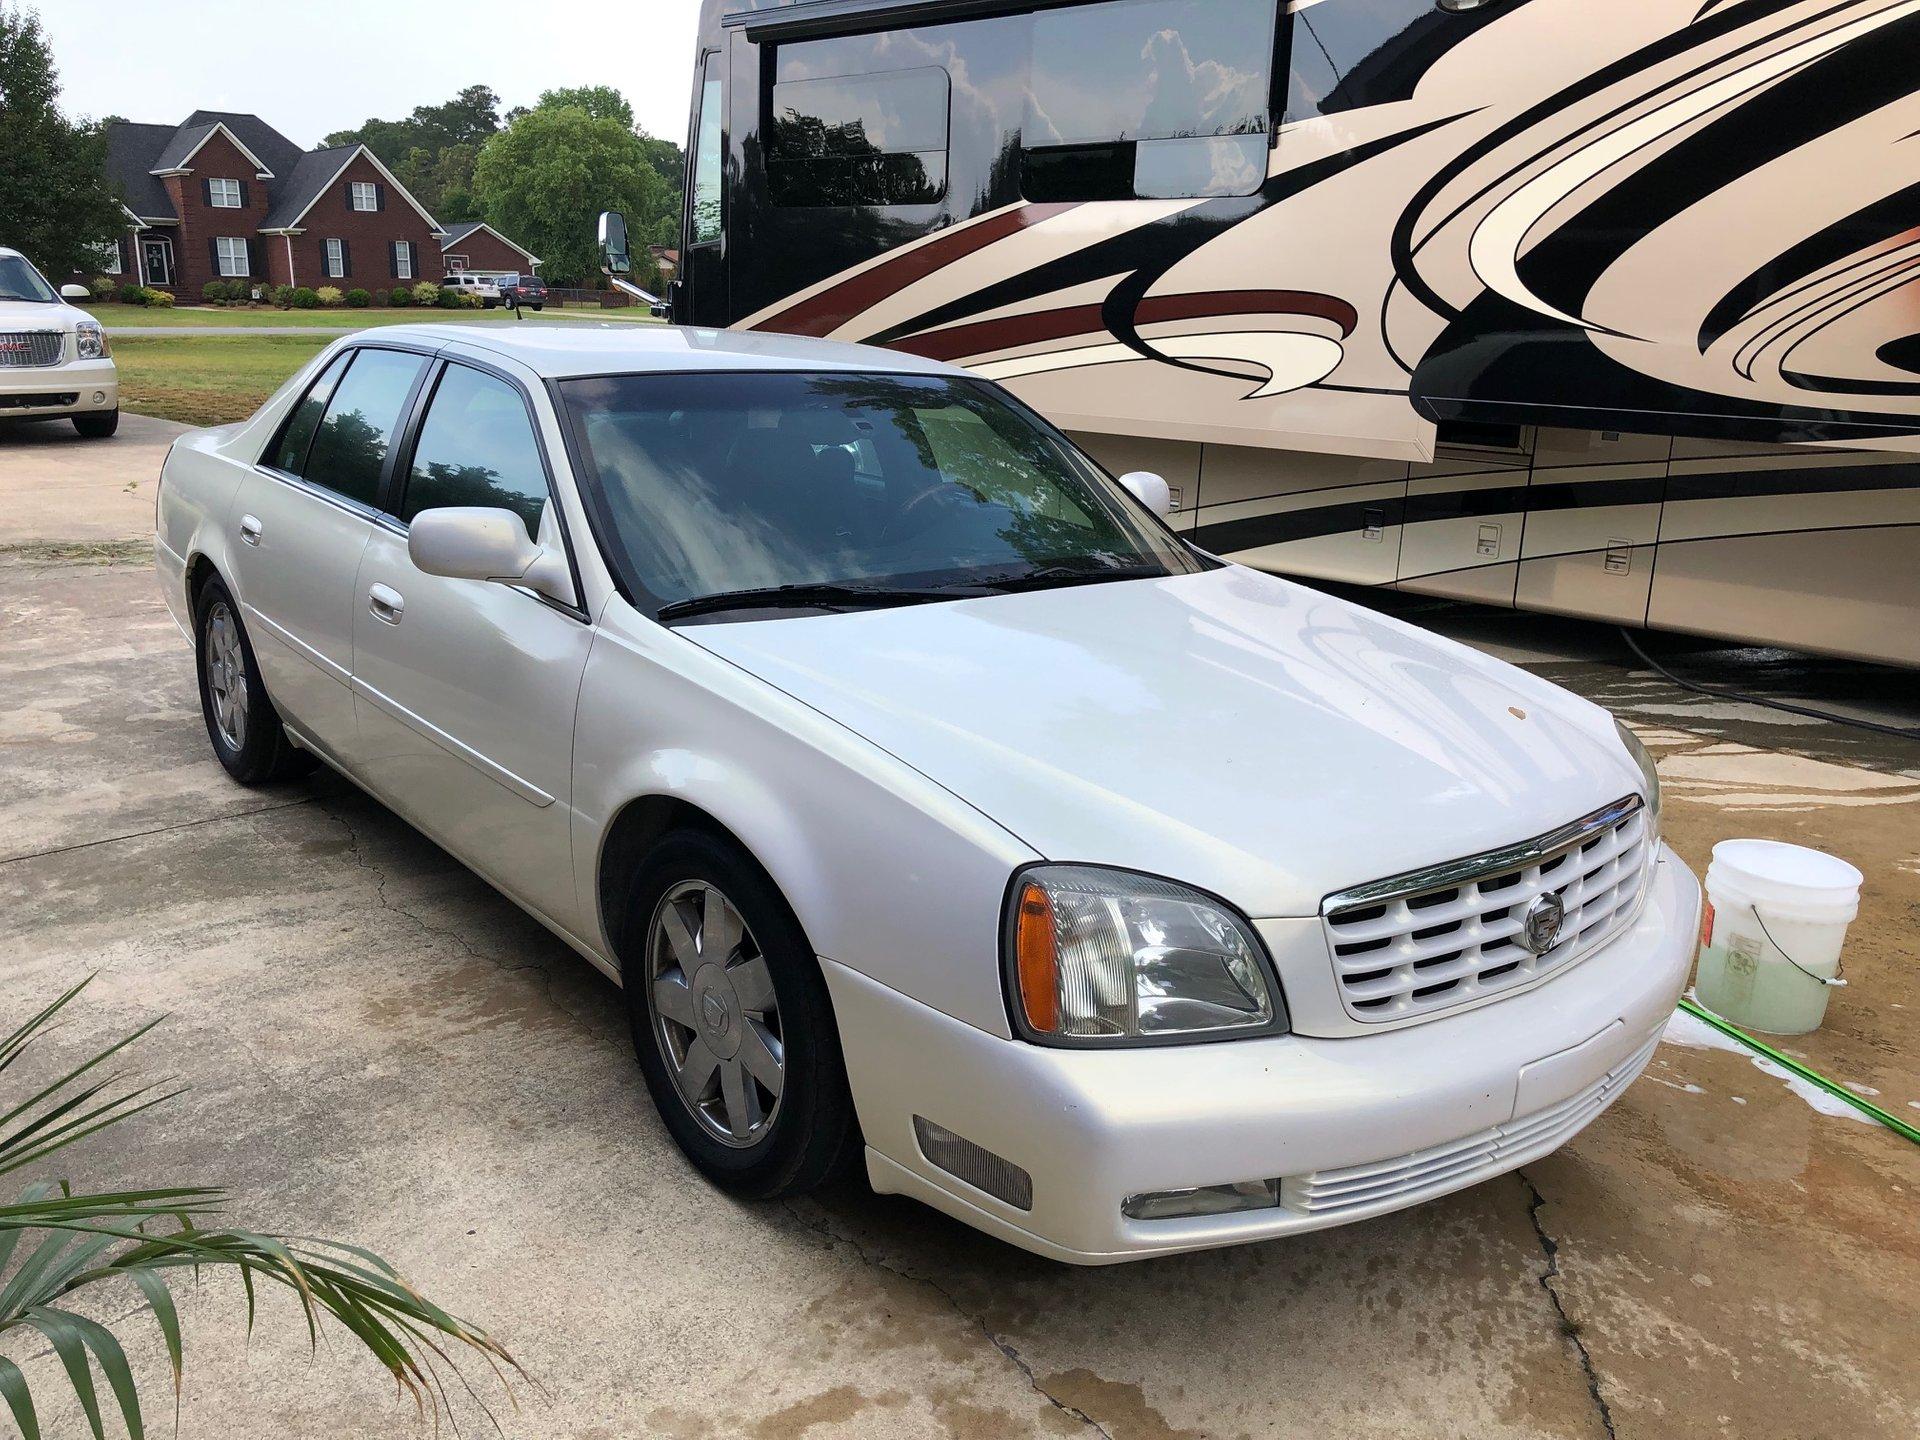 2005 Cadillac DTS | GAA Classic Cars